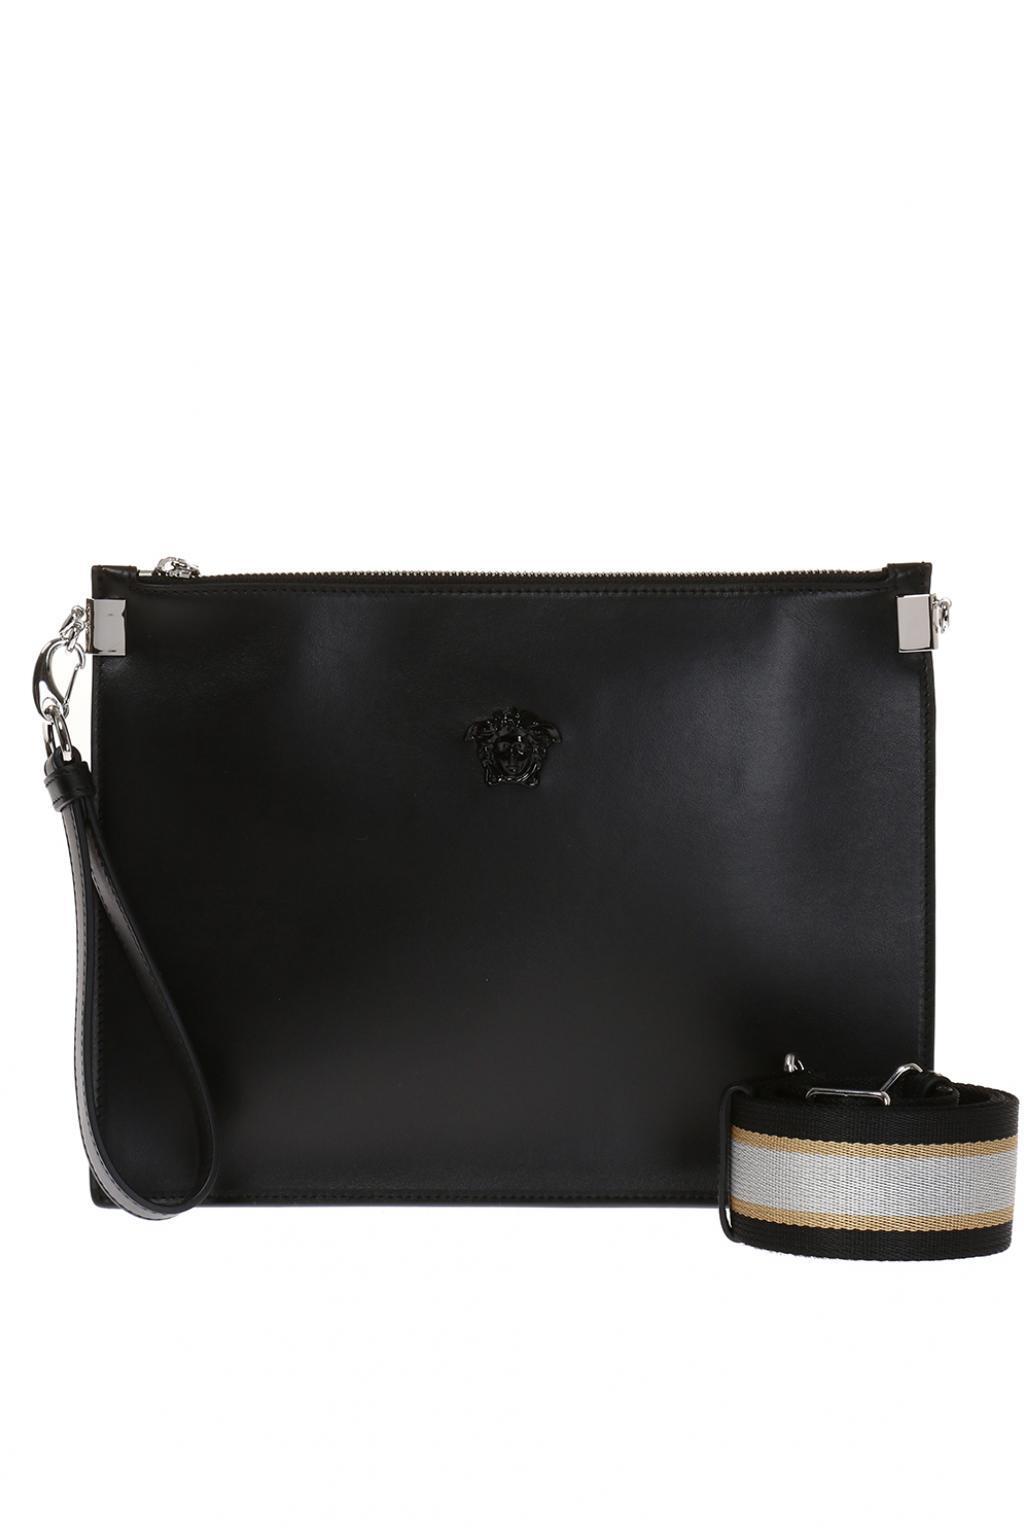 e907dd204bb1 Versace Medusa Head Shoulder Bag in Black - Lyst